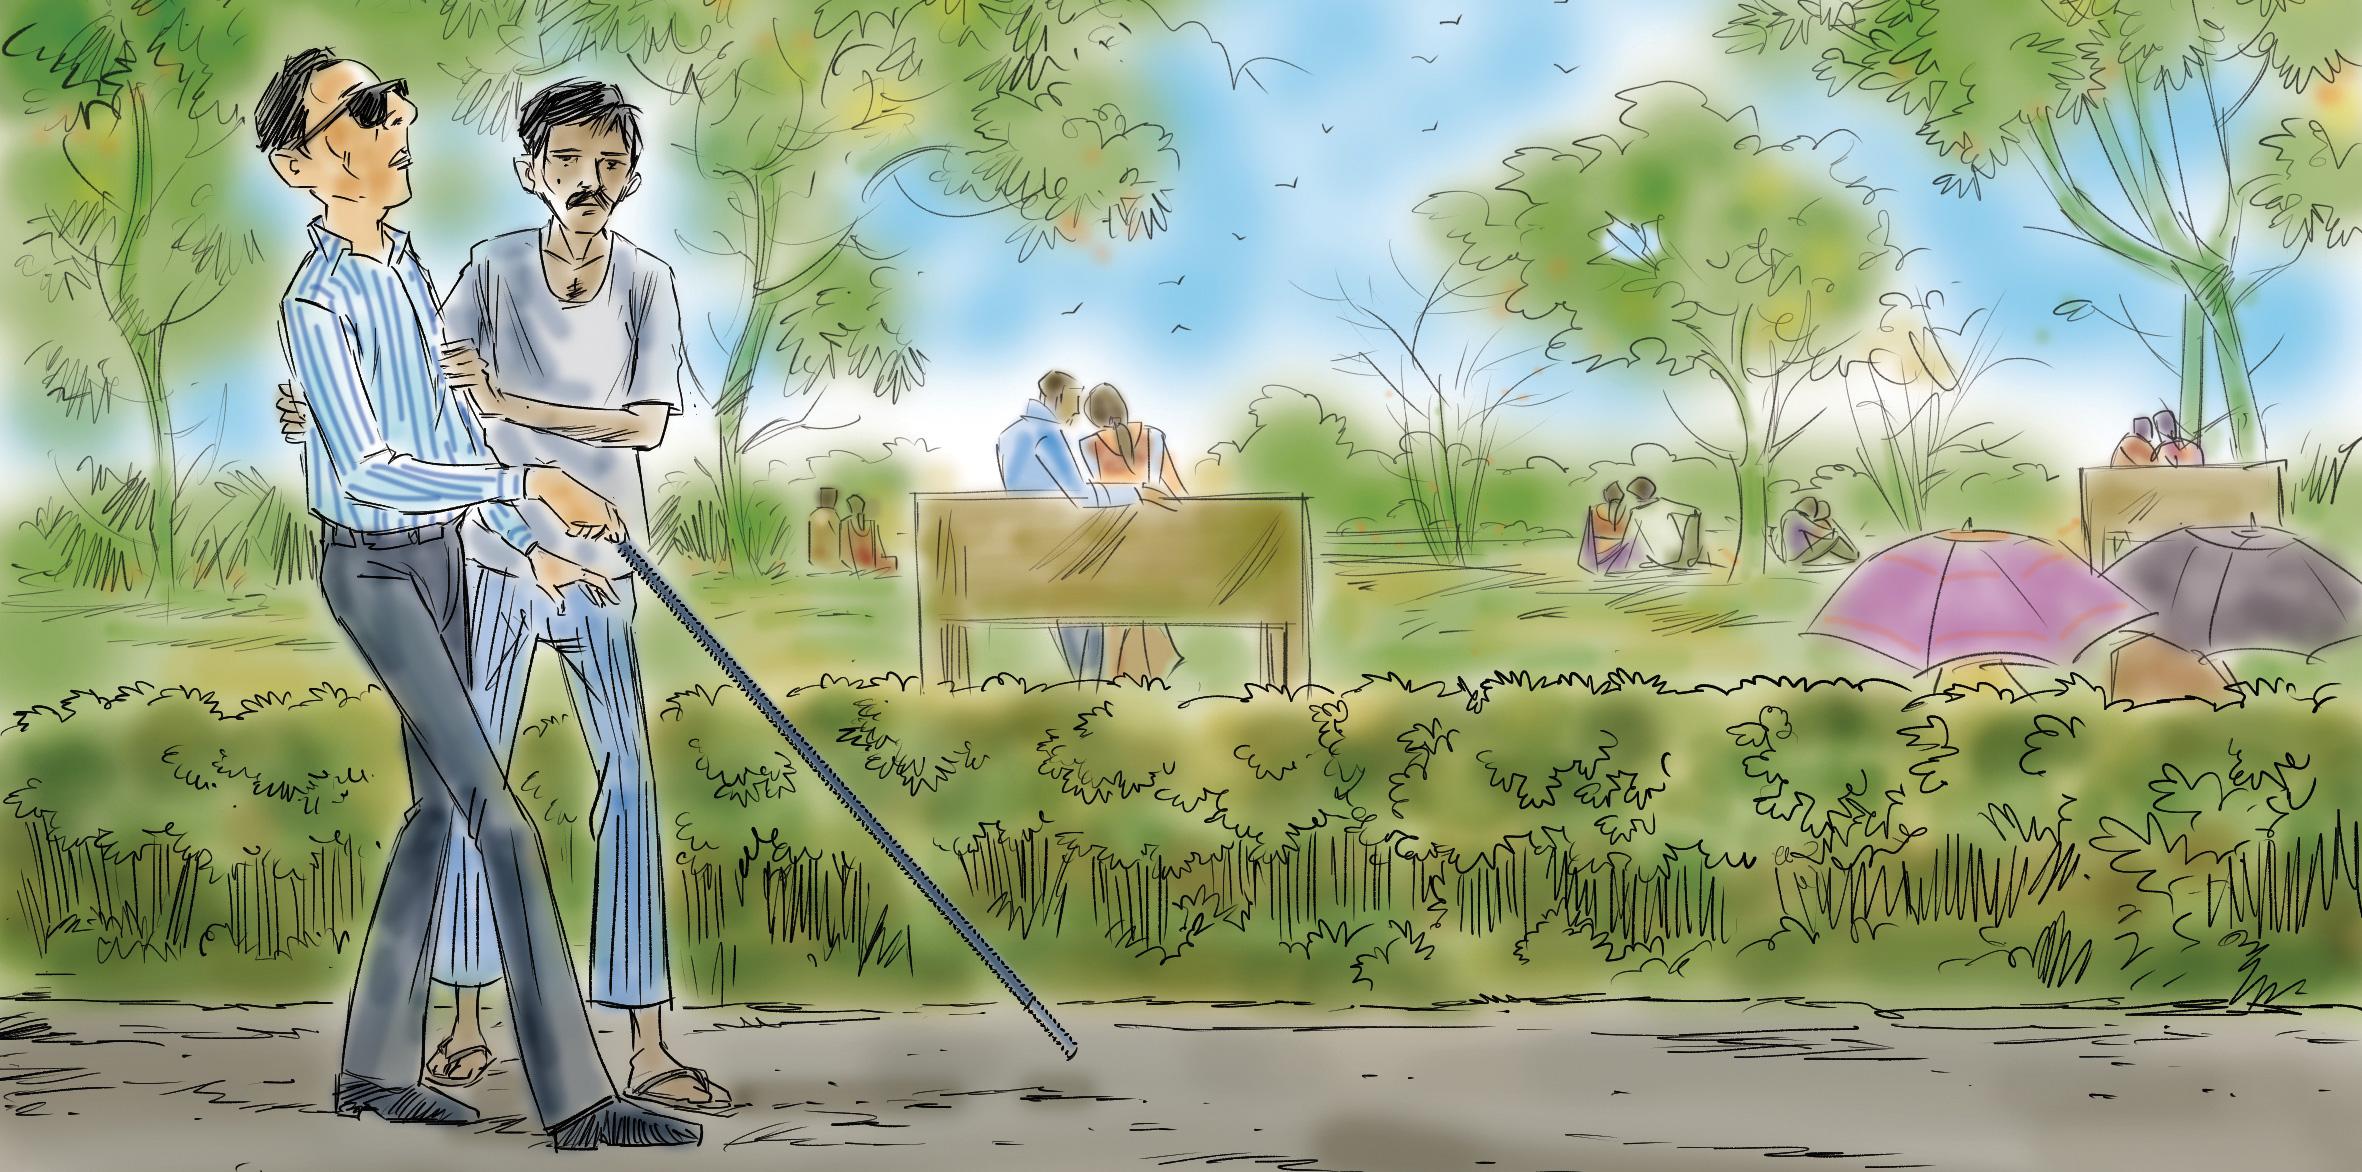 Helping a blind man.